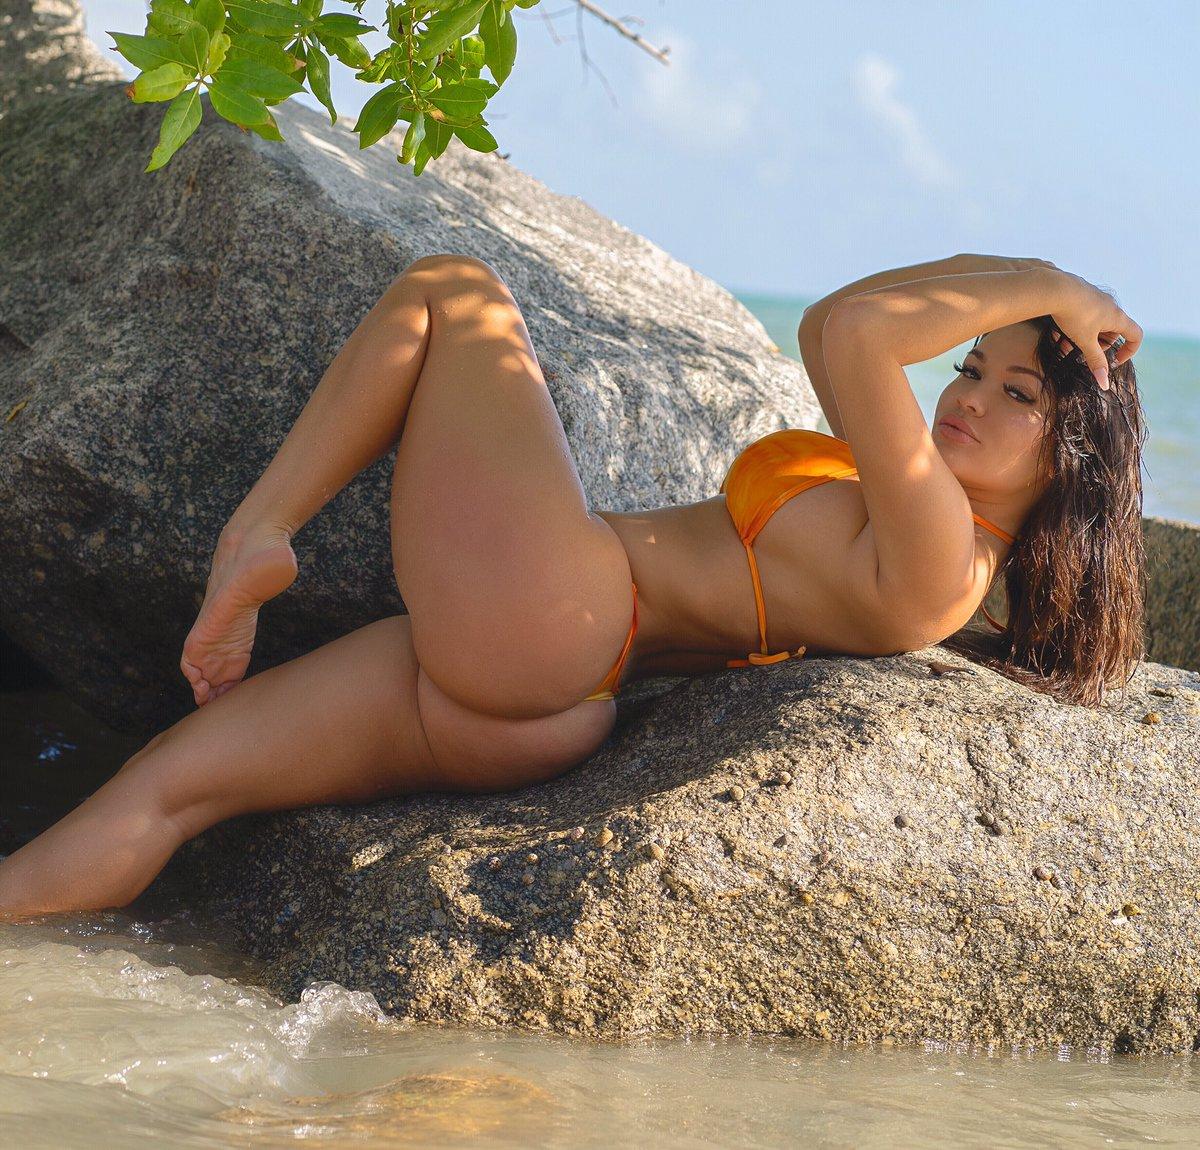 Sideboobs Victoria Sinitsina nudes (25 photos), Topless, Paparazzi, Selfie, panties 2015